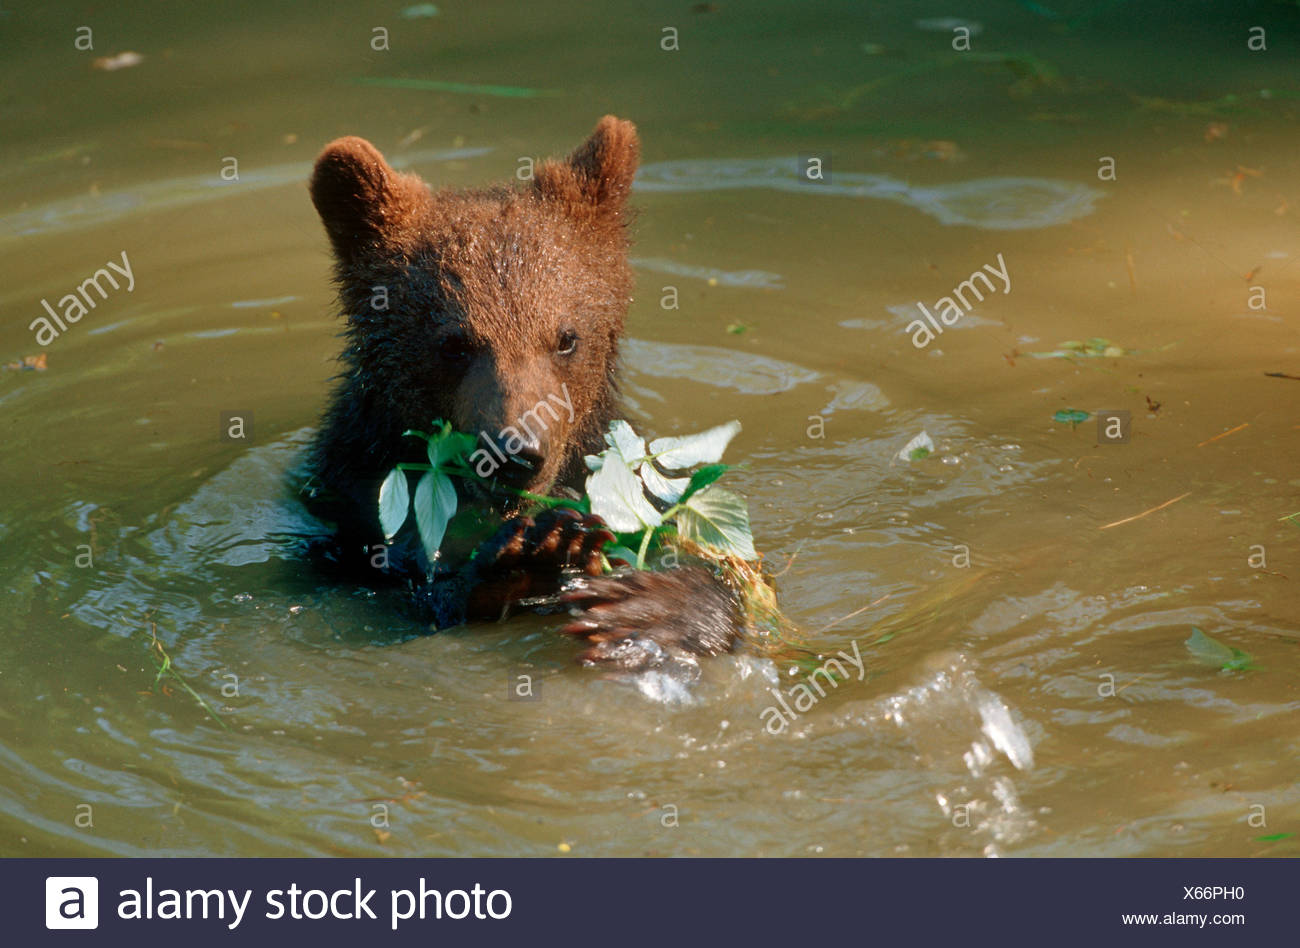 young brown bear in water / Ursus arctos Stock Photo